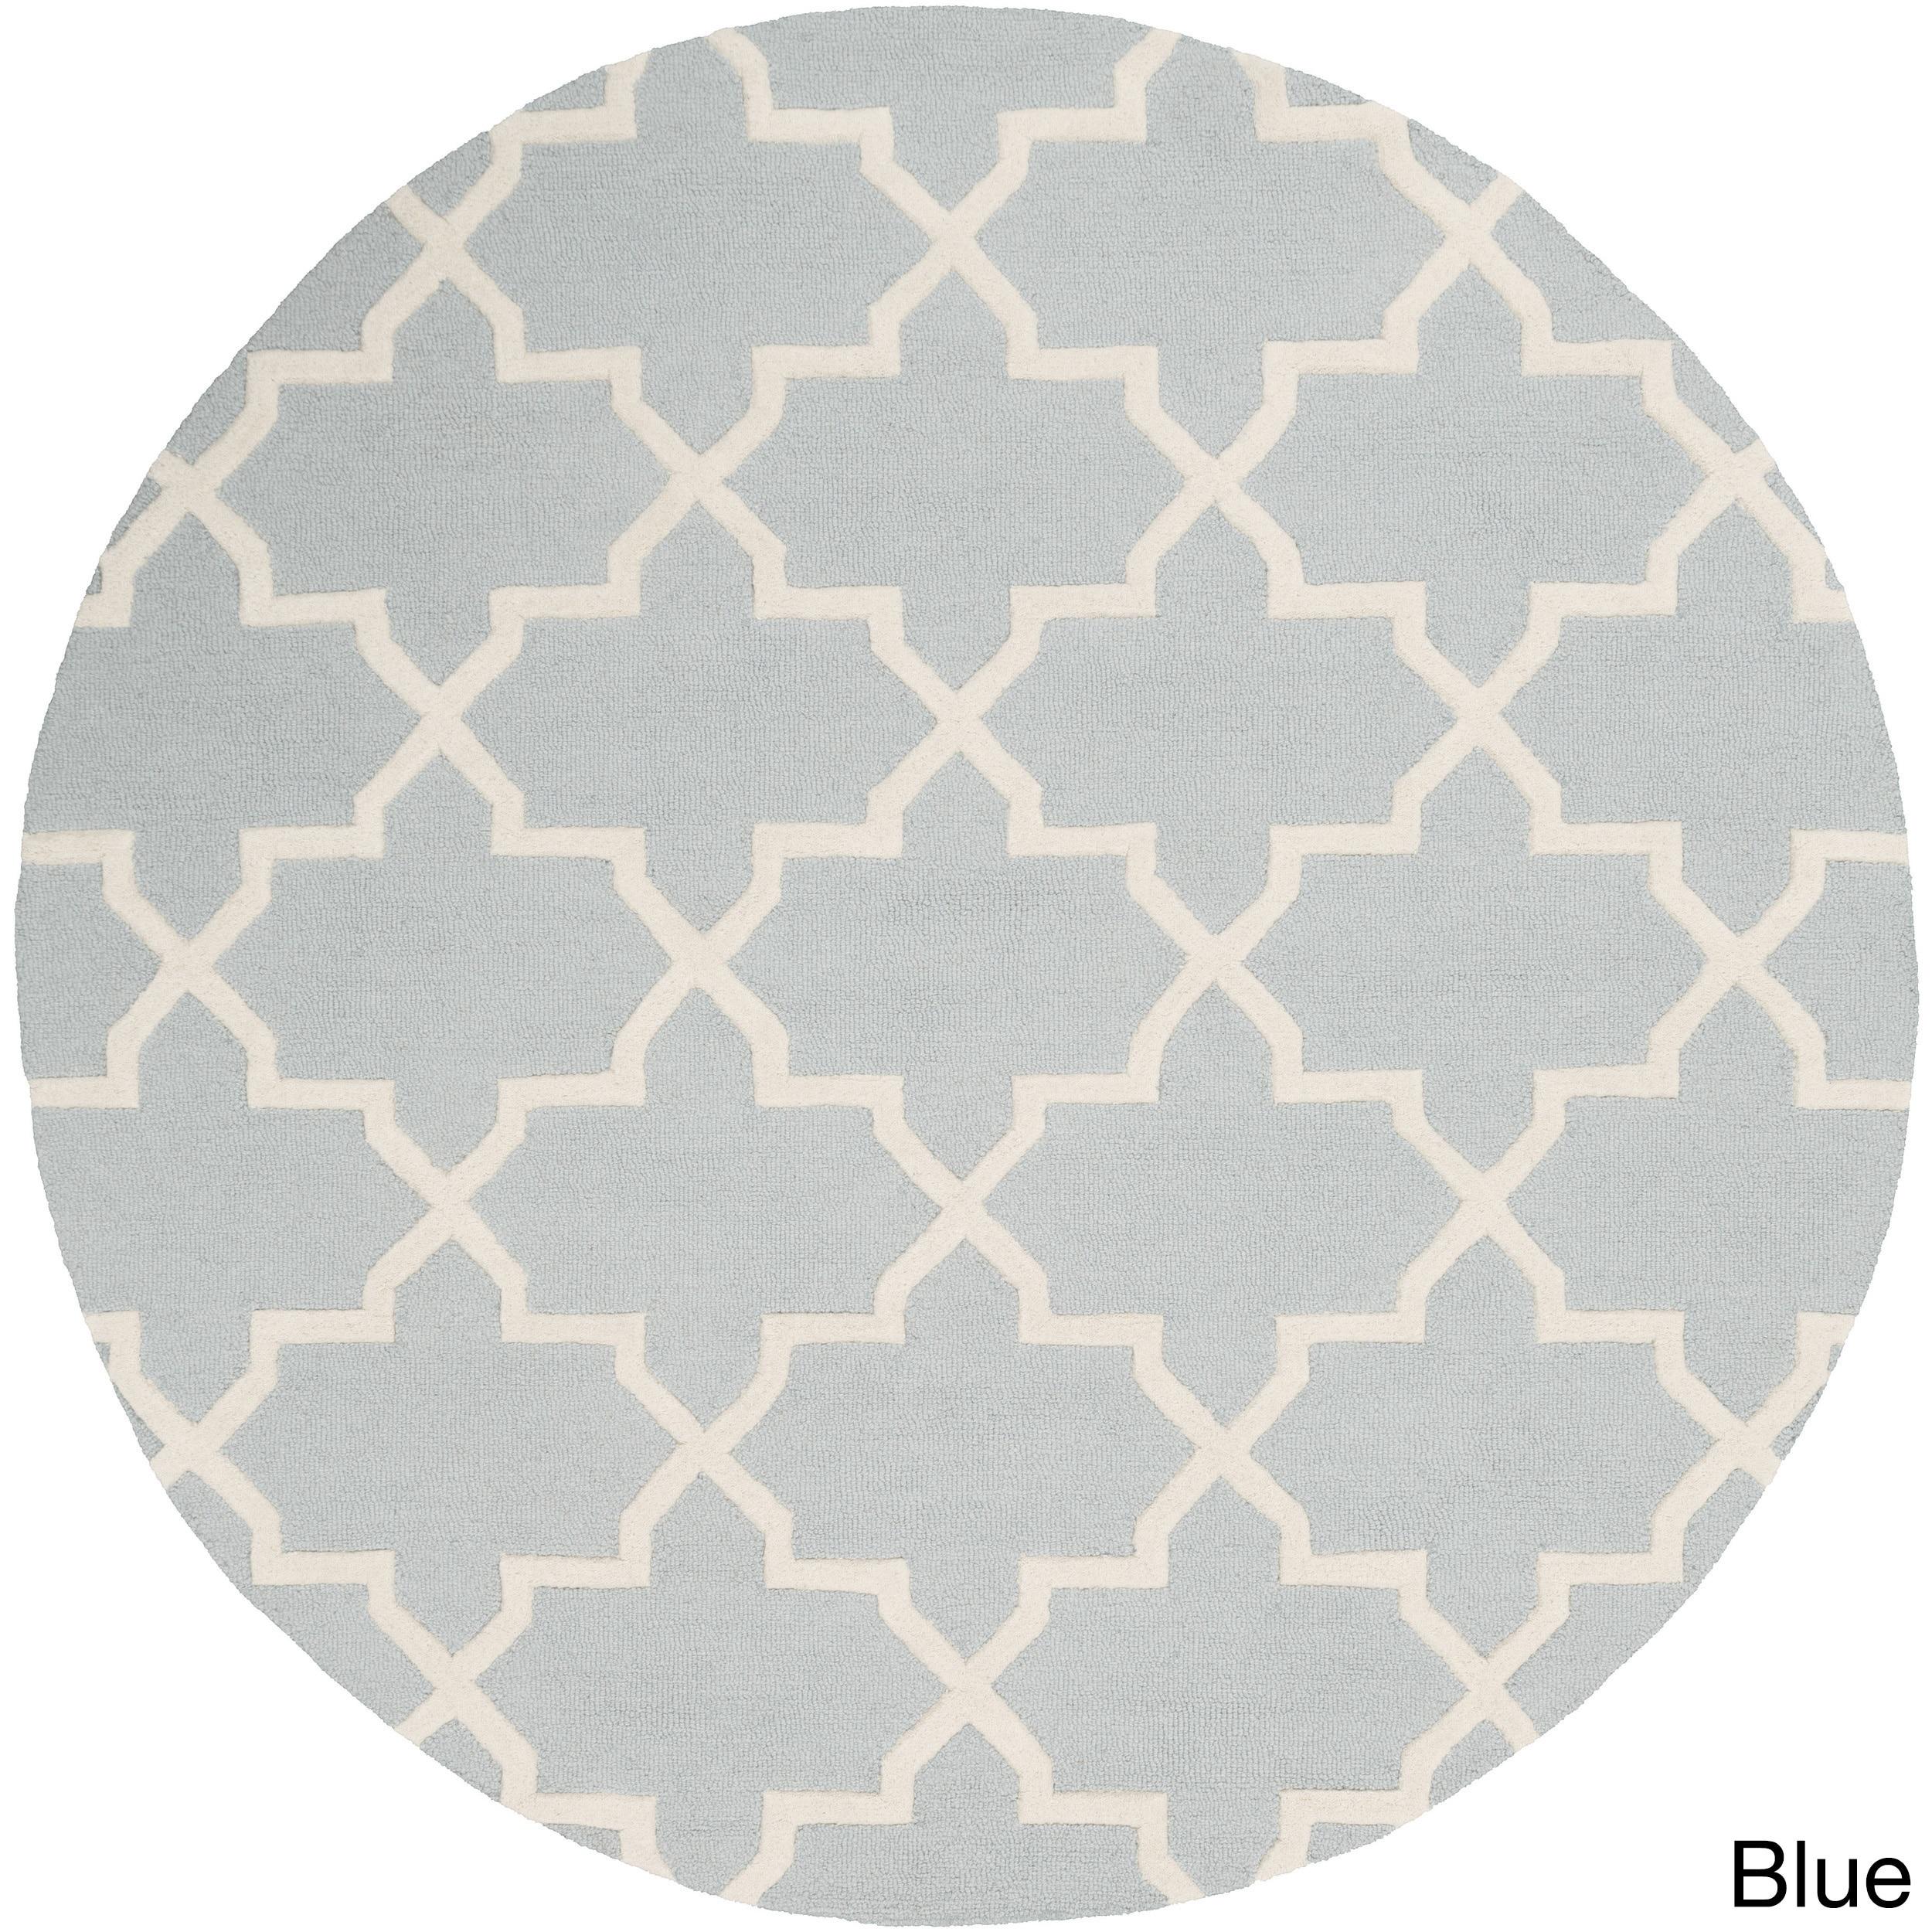 SURYA Hand-Tufted Ethel Moroccan Tiled Wool Rug (8' Round...